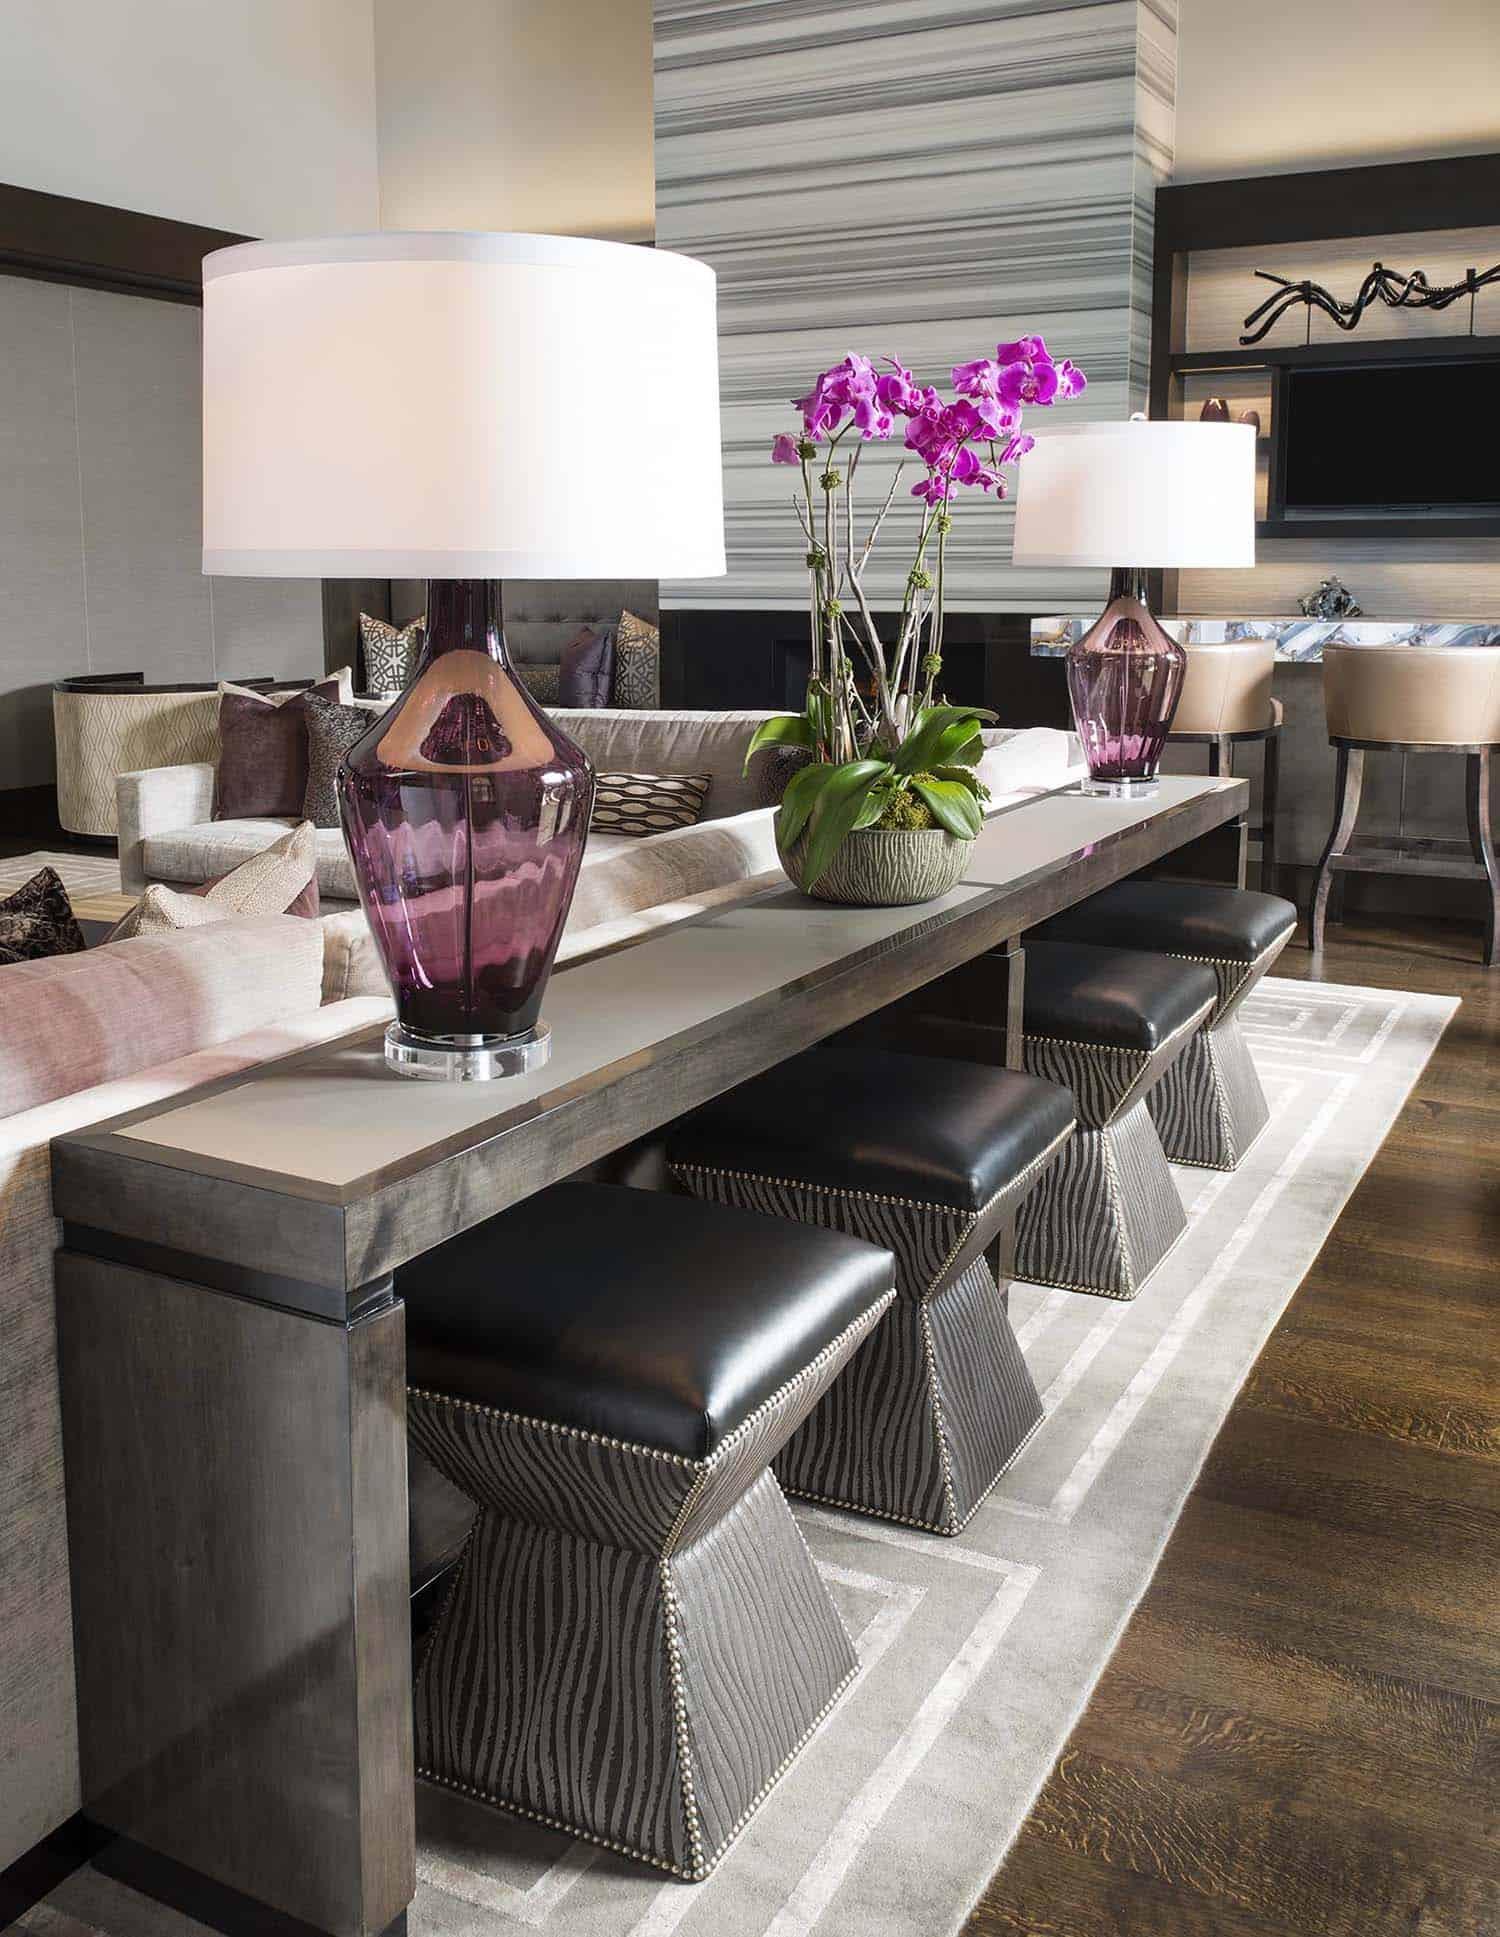 Contemporary Style Home-Dallas Design Group-15-1 Kindesign